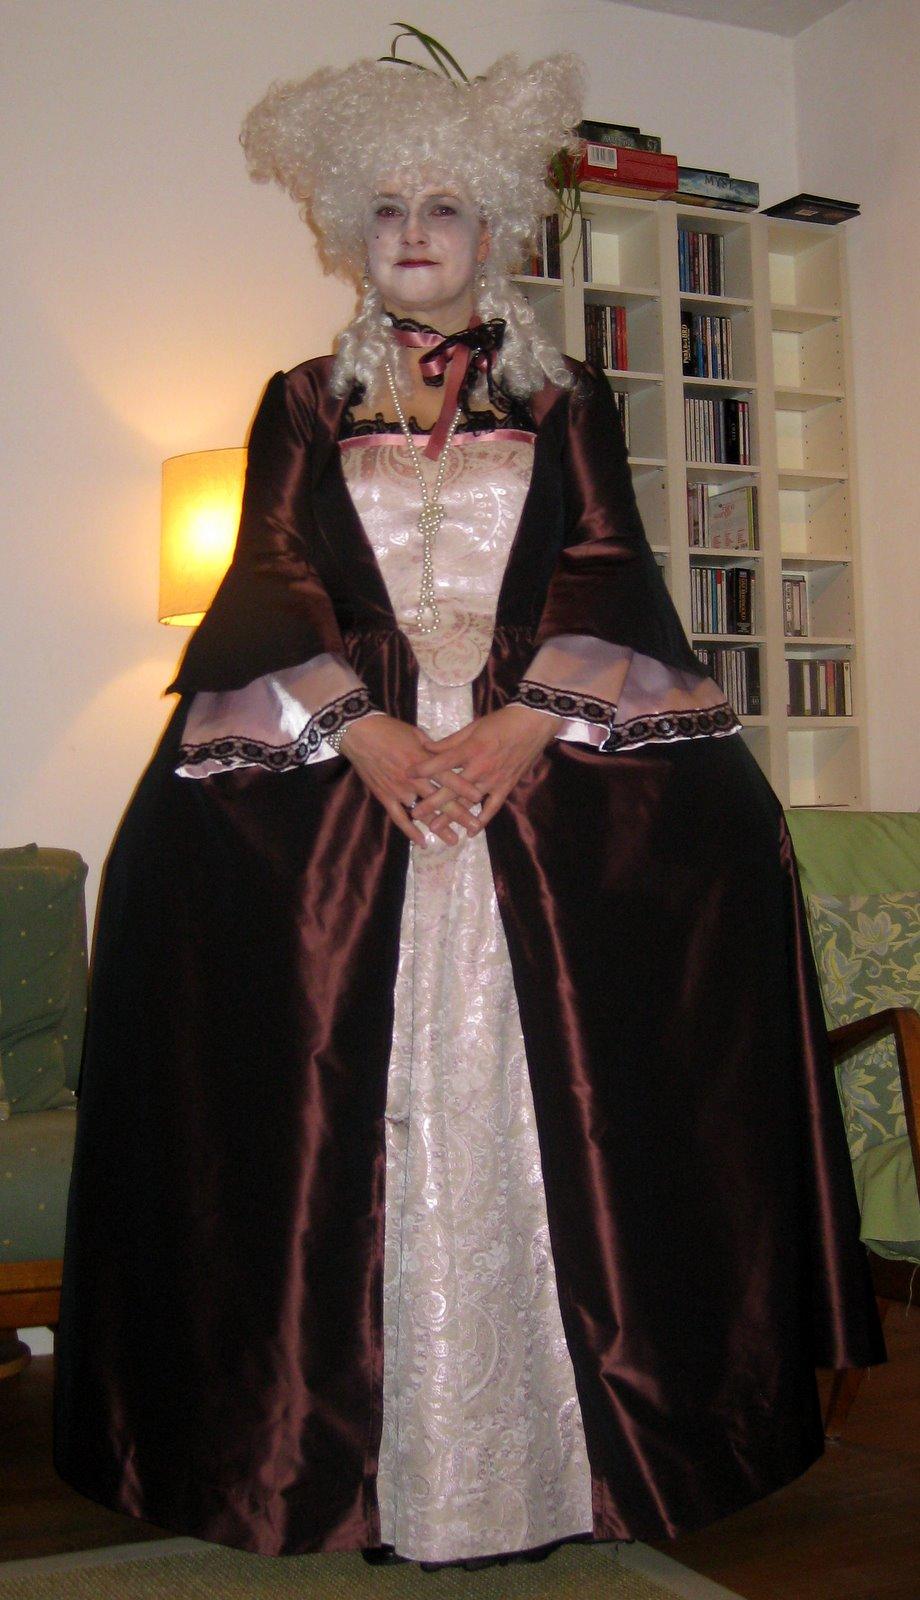 Burda schnittmuster rokoko kleid